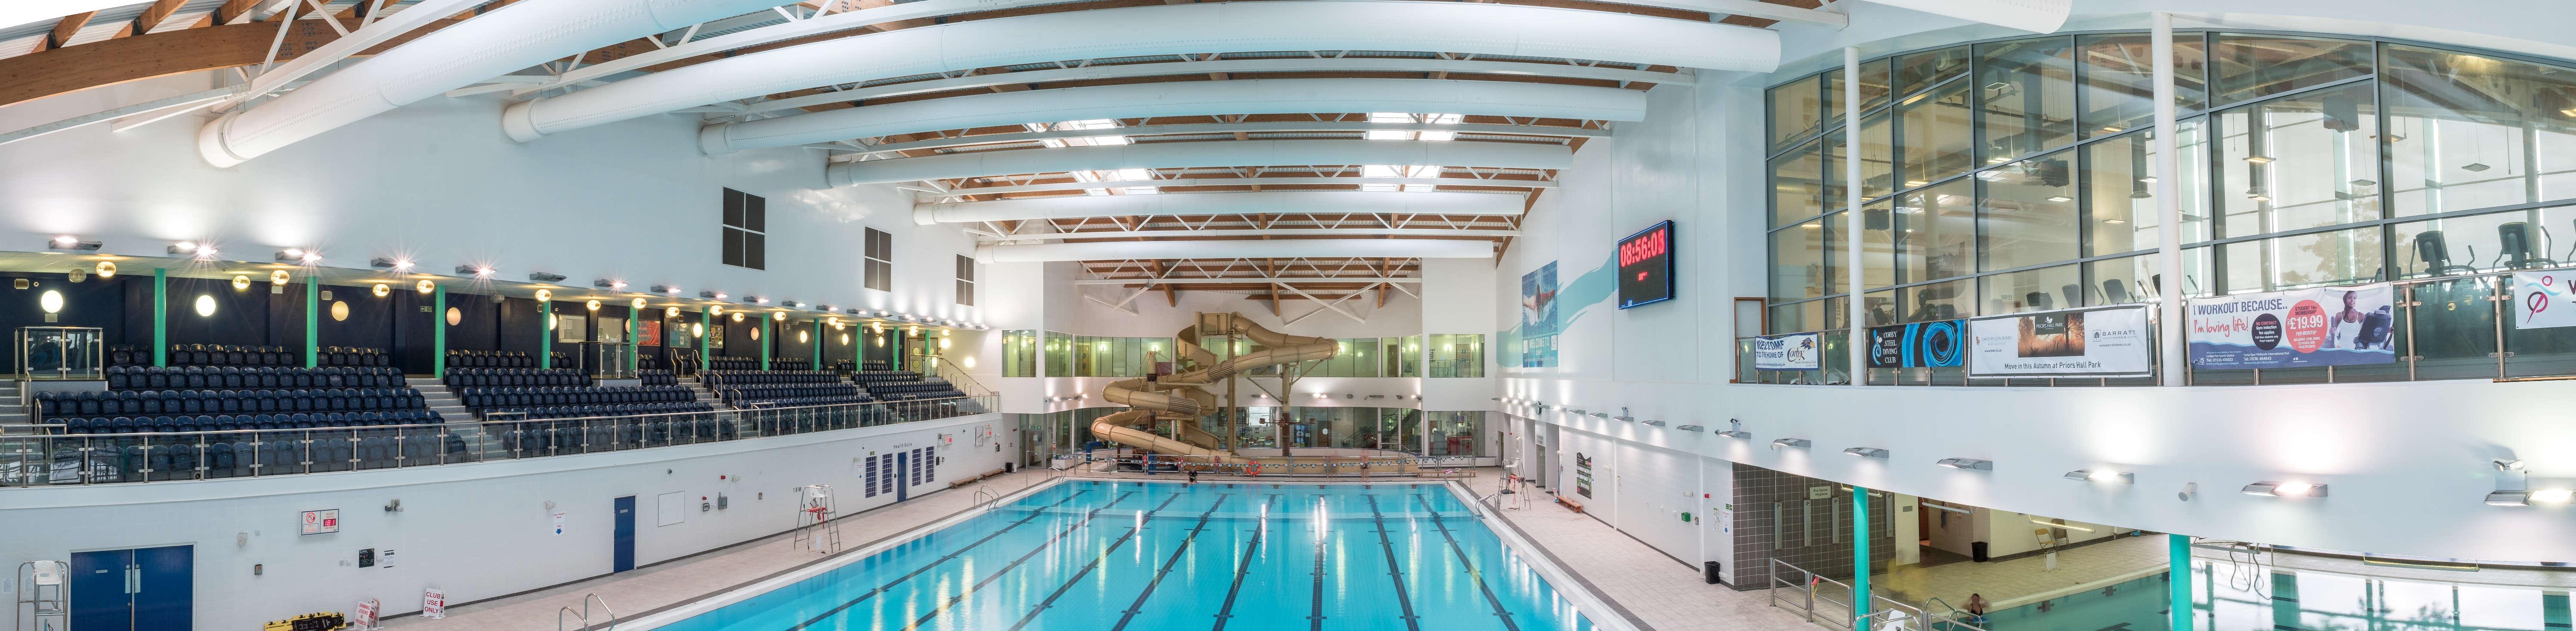 Corby International Pool Pano Compress